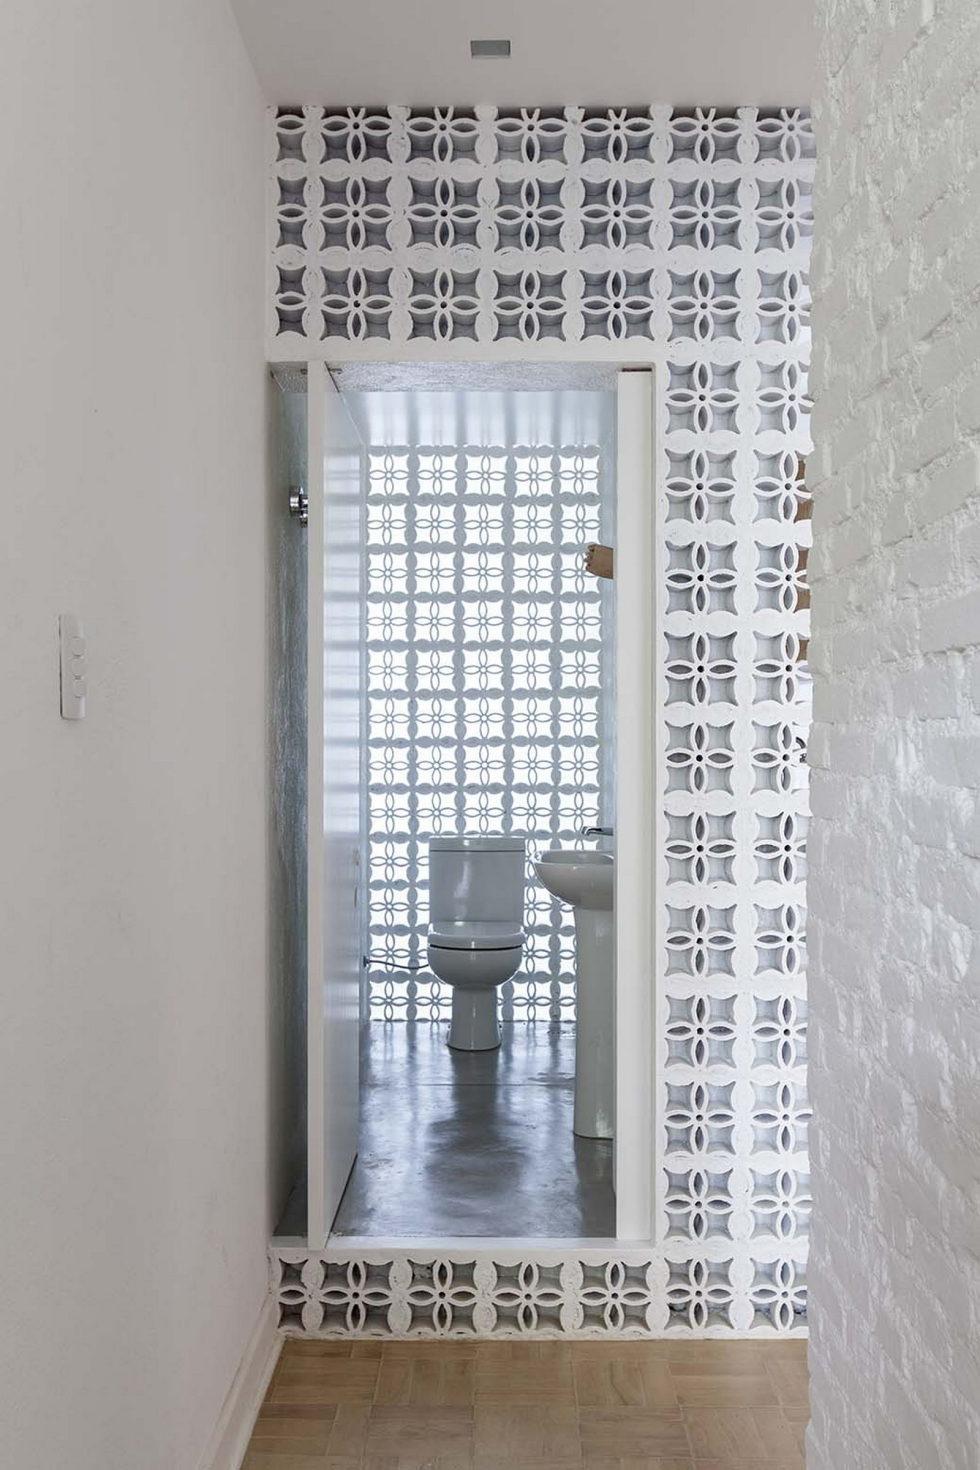 ap-cobogo-the-apartments-in-sao-paulo-11